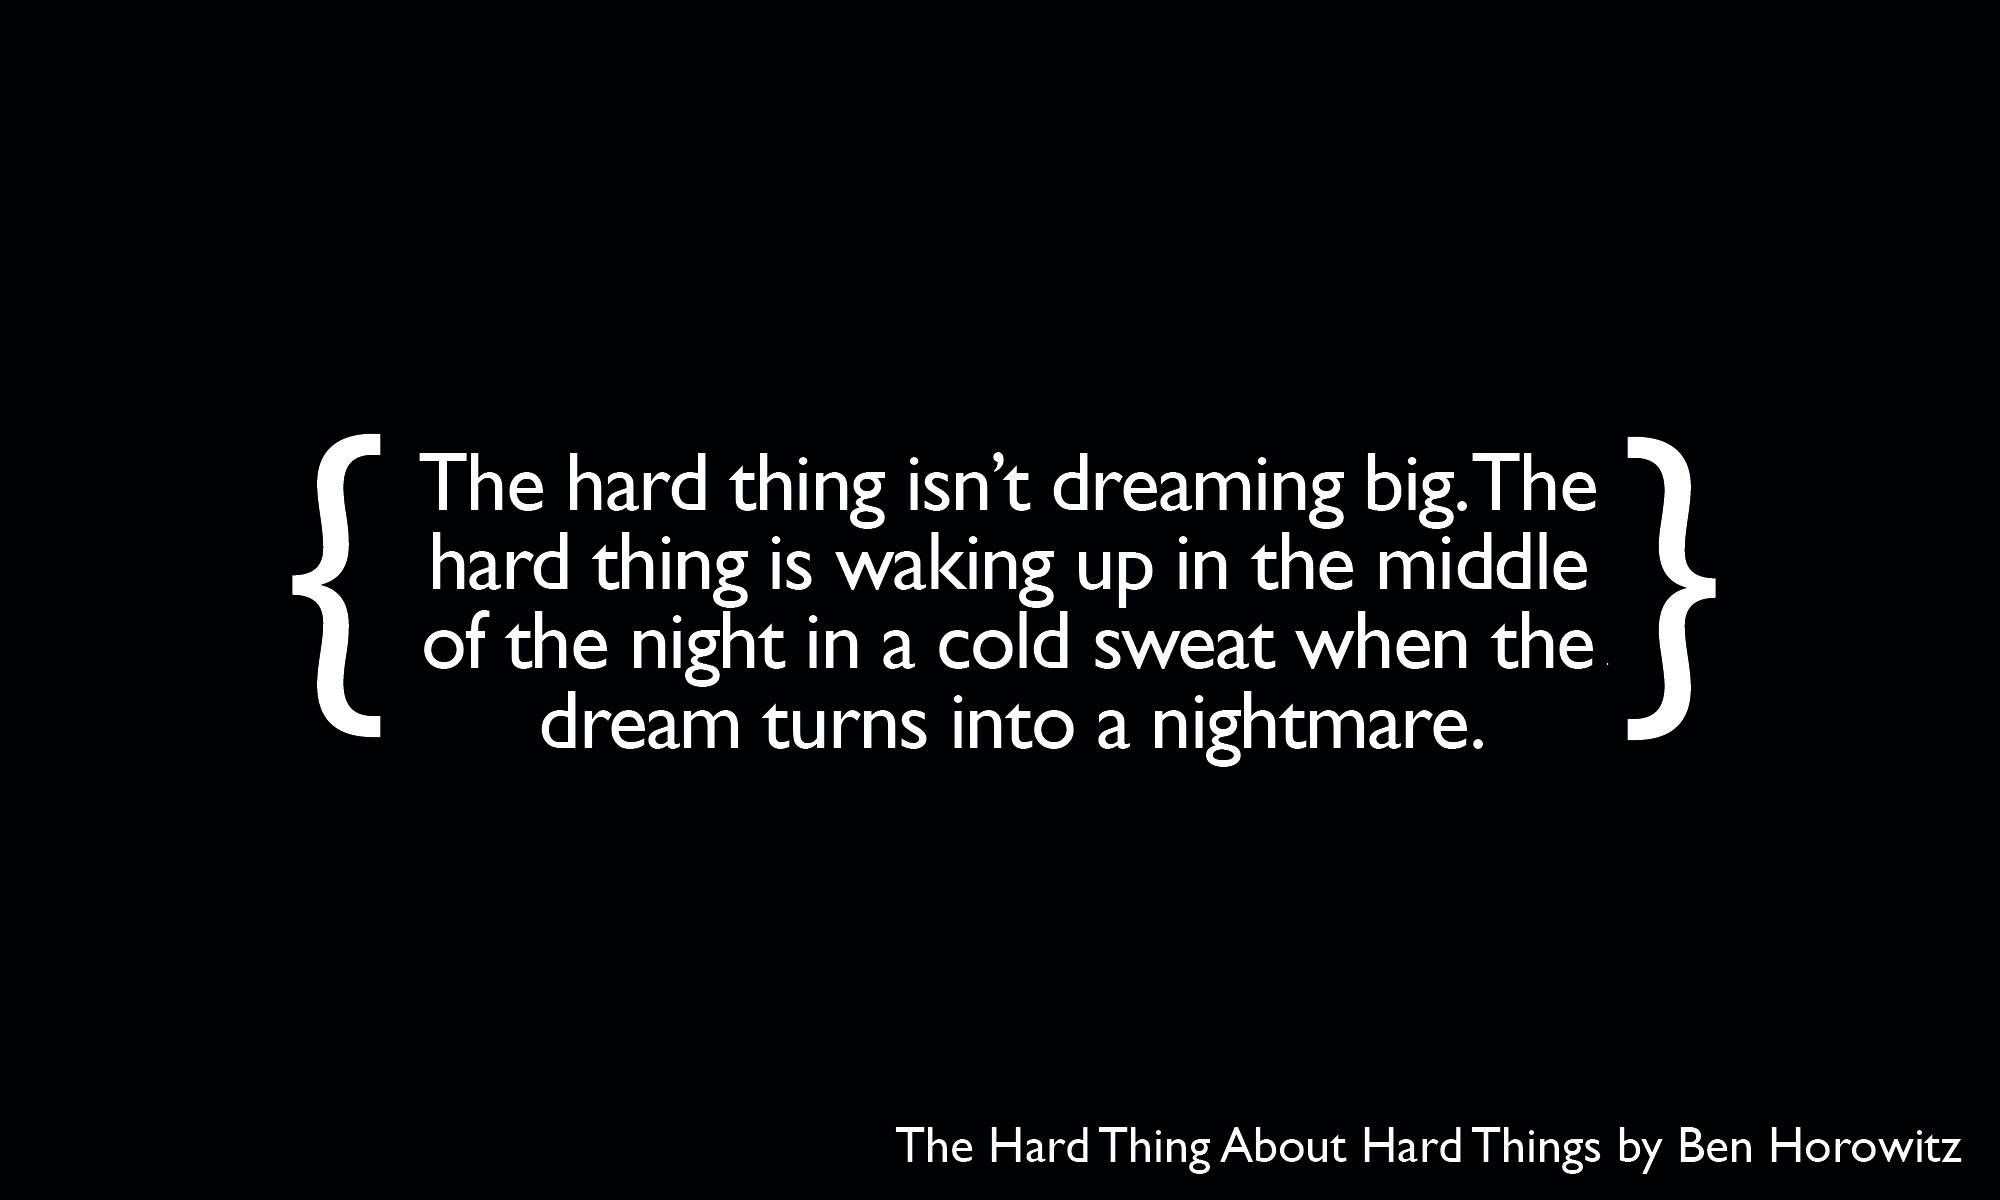 The hard thing isn't dreaming big…